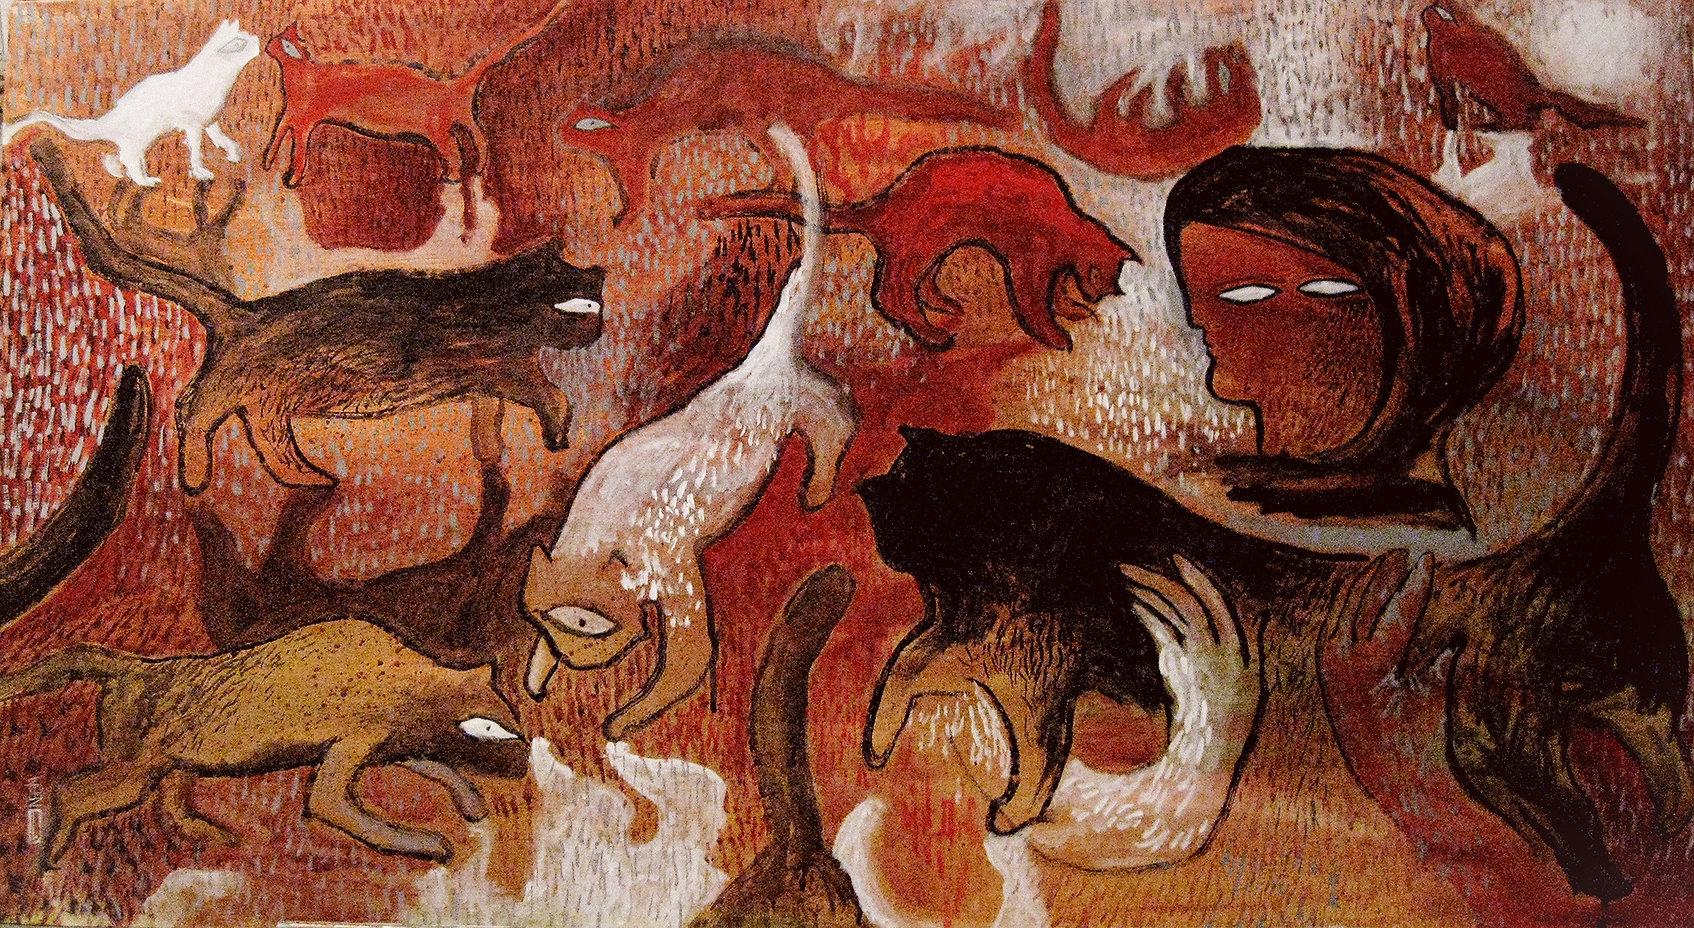 Neginete,Negin Ehtesabian, Iranian artist, activist artist, iran green movement, iran art, cave painting, iranian artists, middle east art, feminism art, woman art